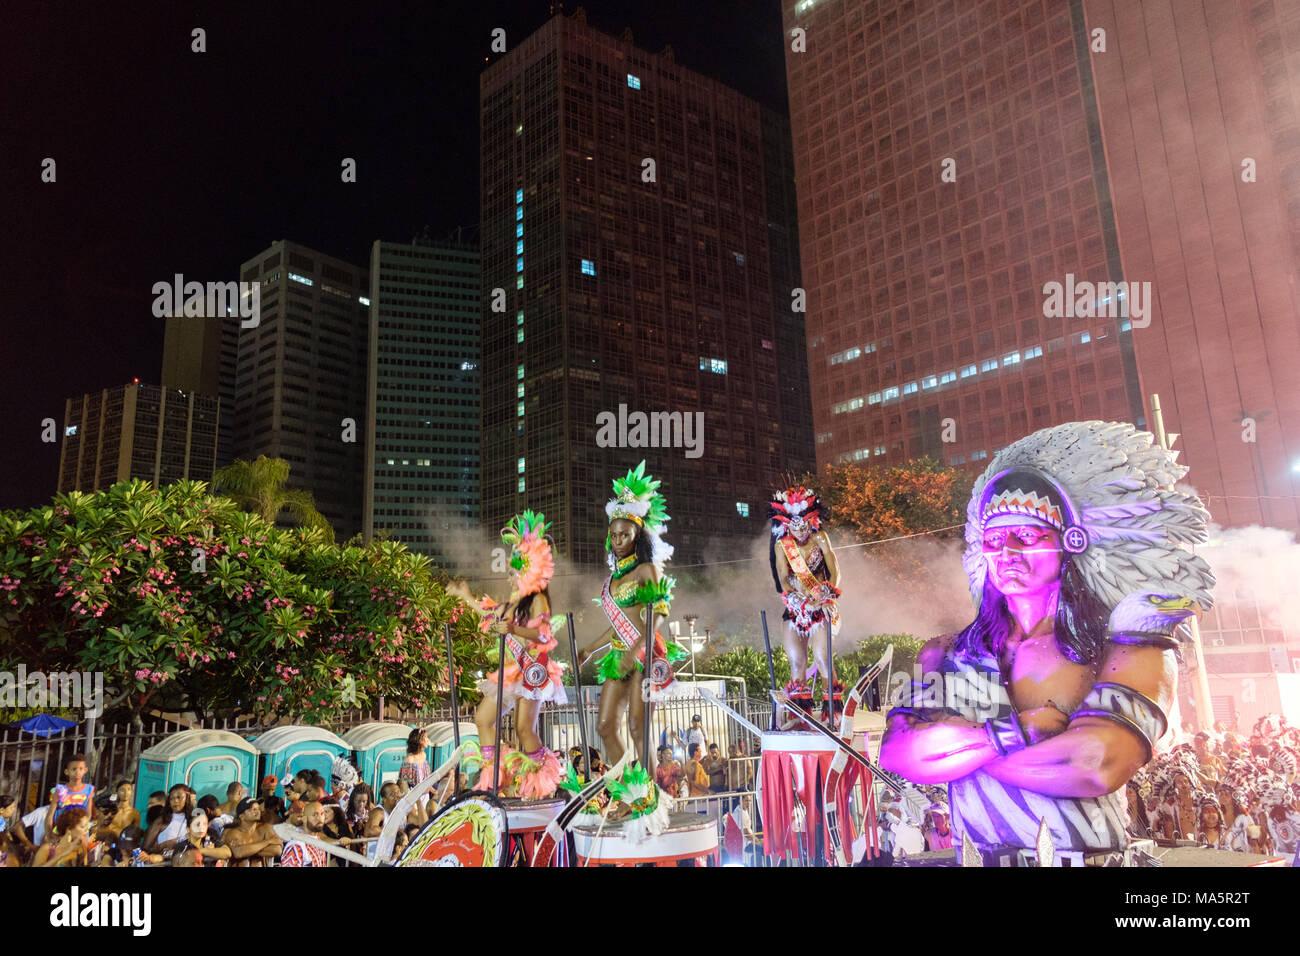 Cacique de Ramos street troupe, Rio carnival 2018, Brazil - Stock Image